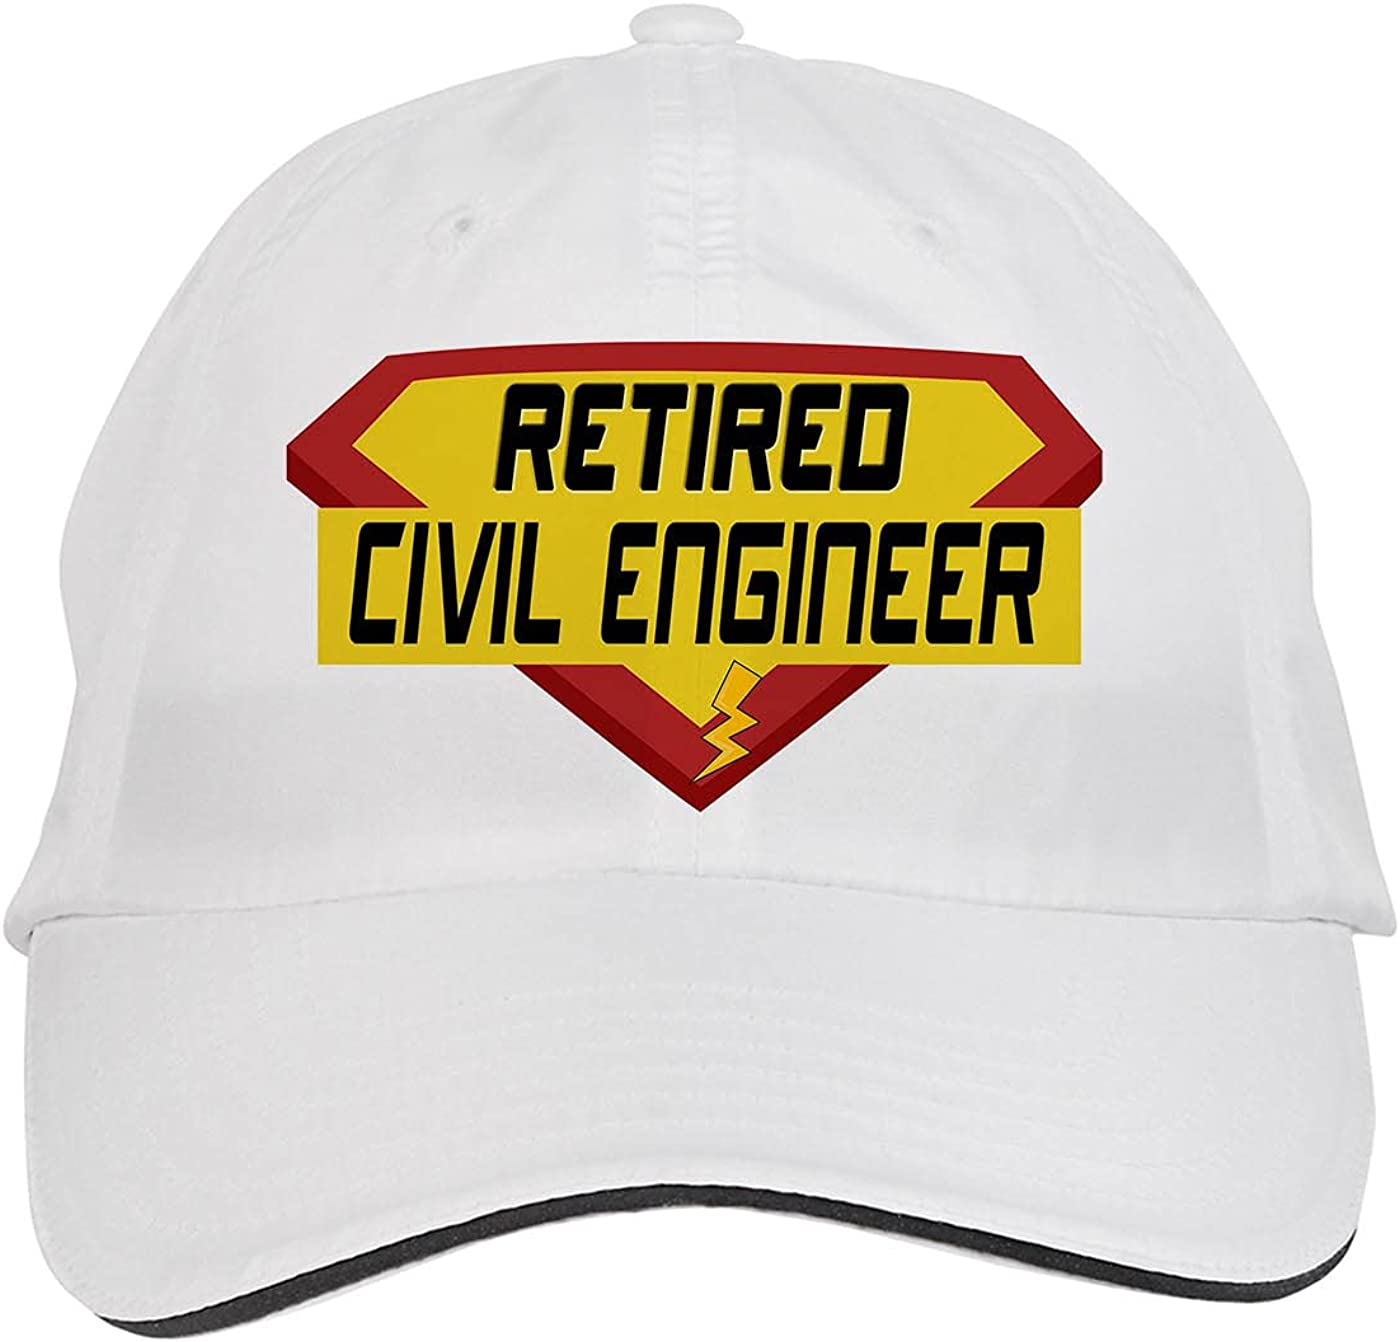 Makoroni - Retired Civil Engineer Career Hat Adjustable Cap, DesJ82 White